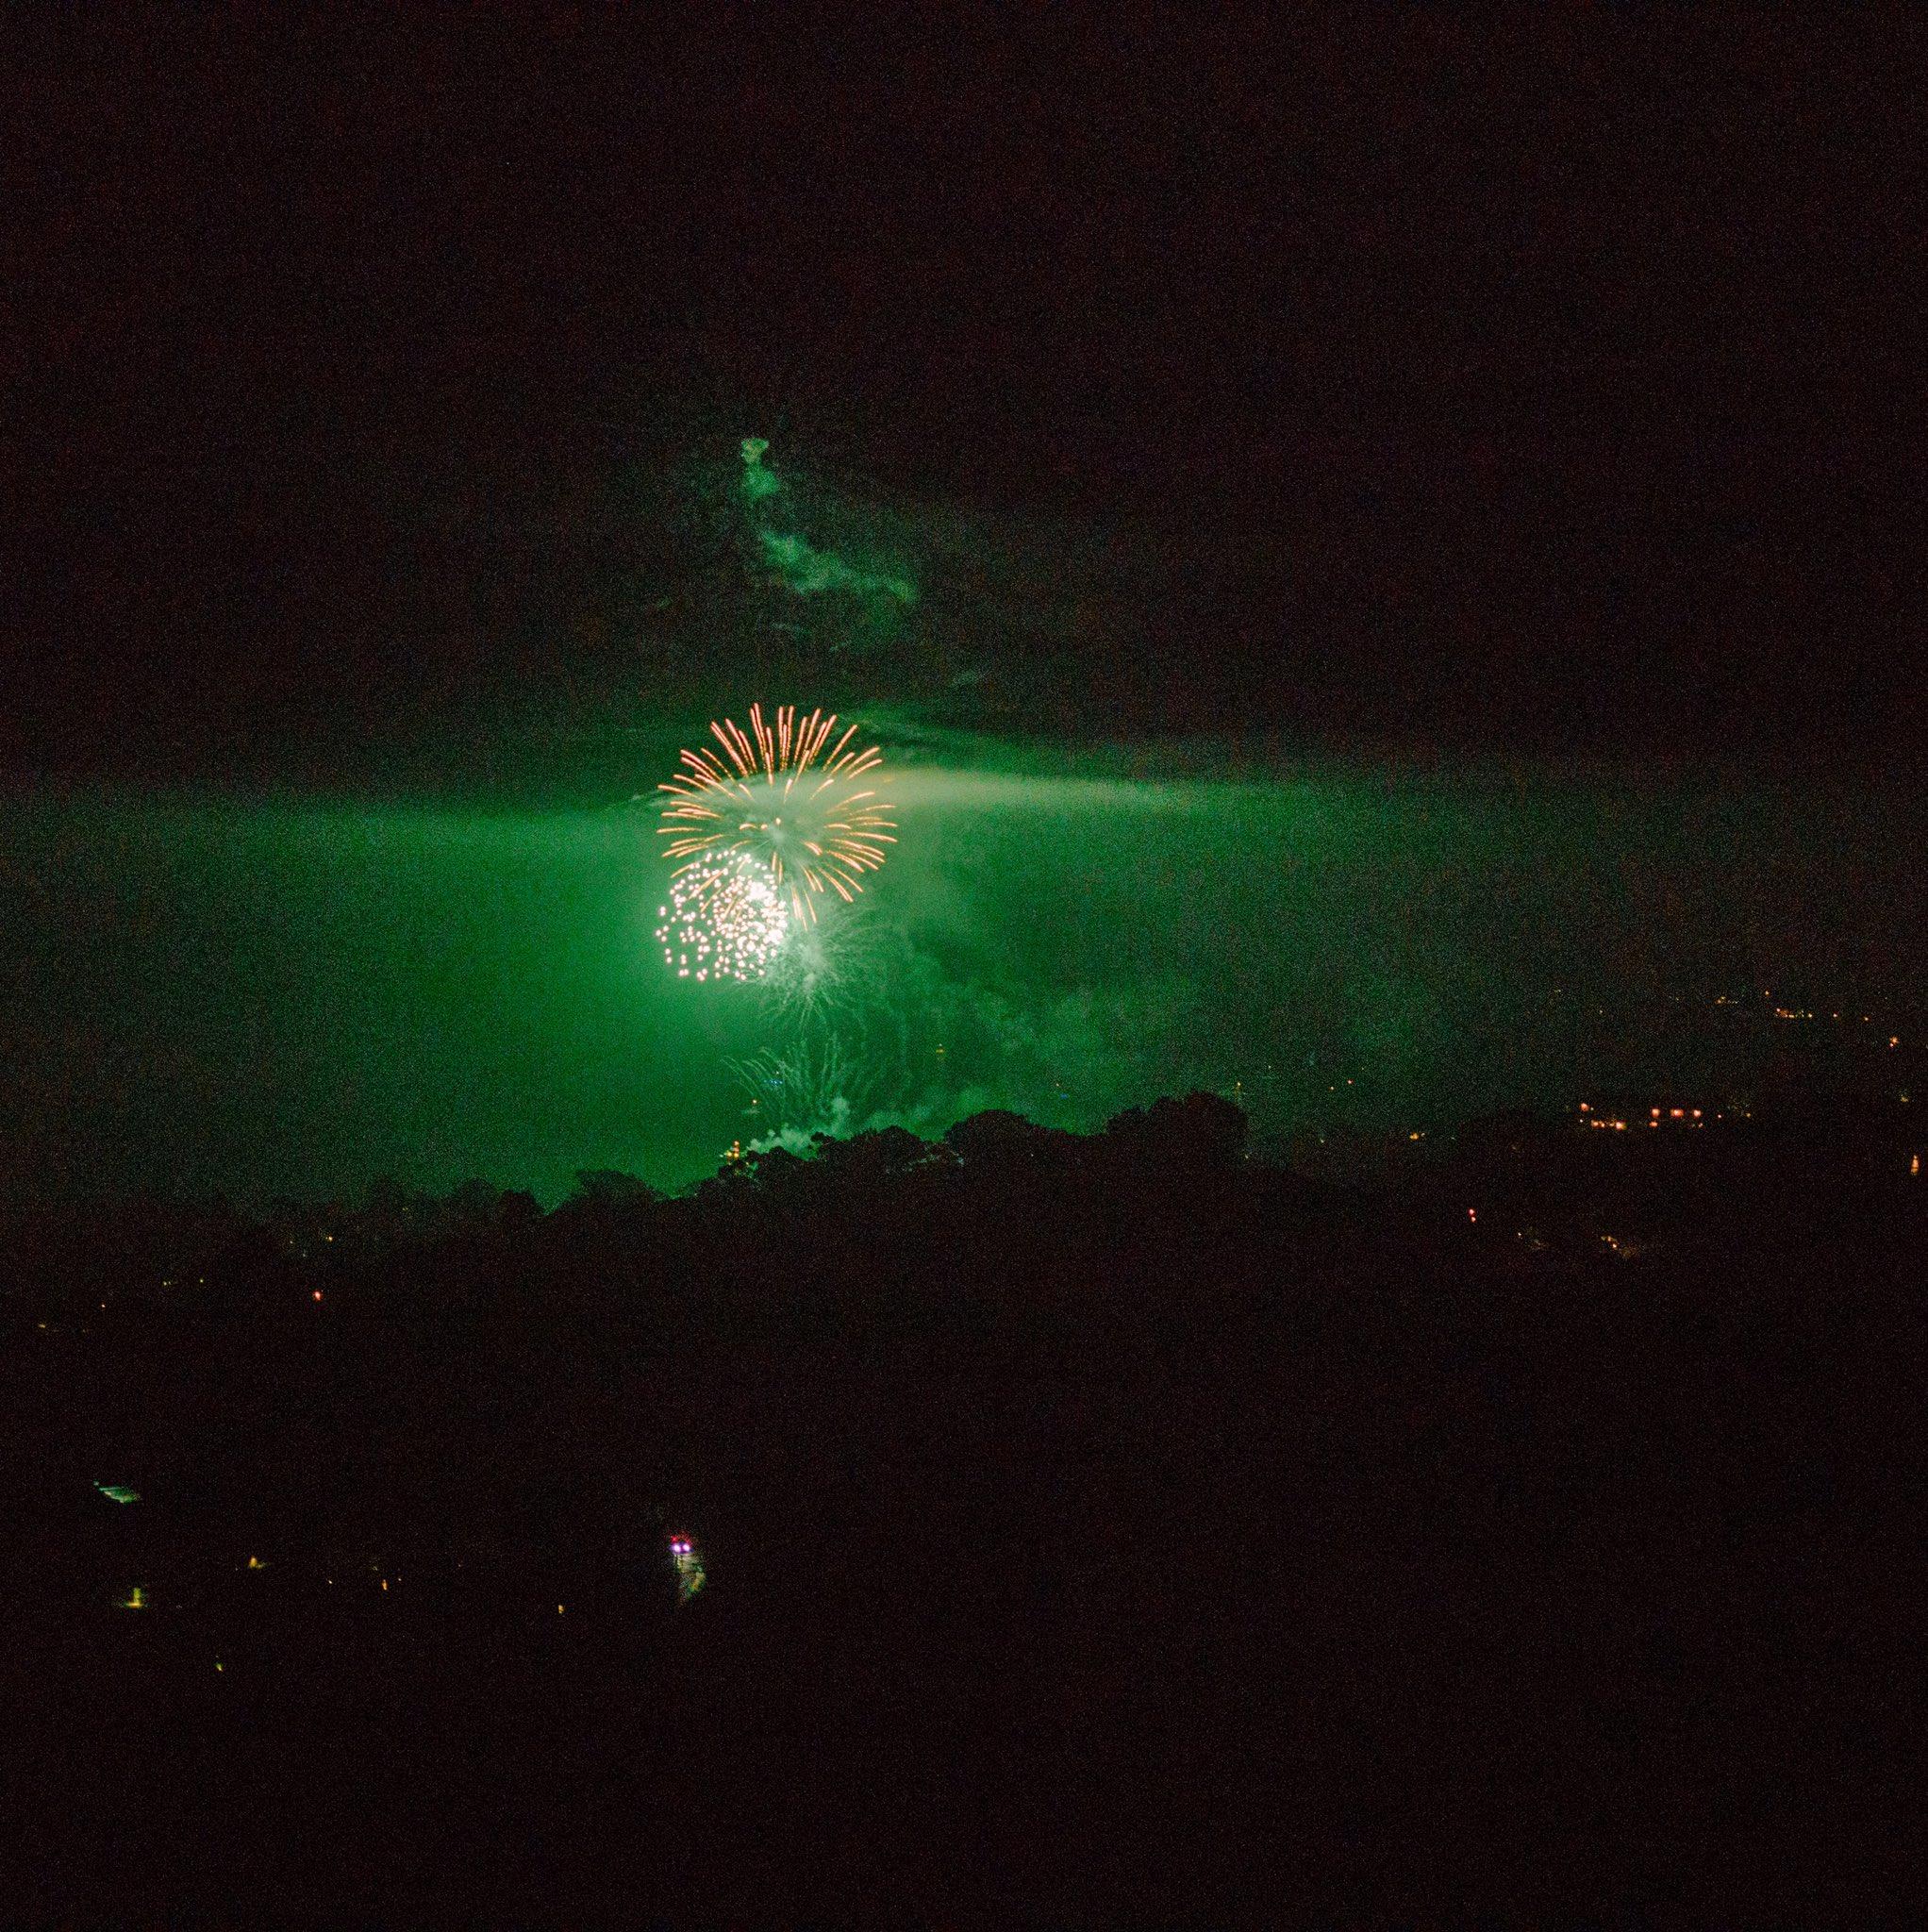 Firework photos I took last night. ���� Instagram: thisforeverland https://t.co/3GI6wWK9Eu